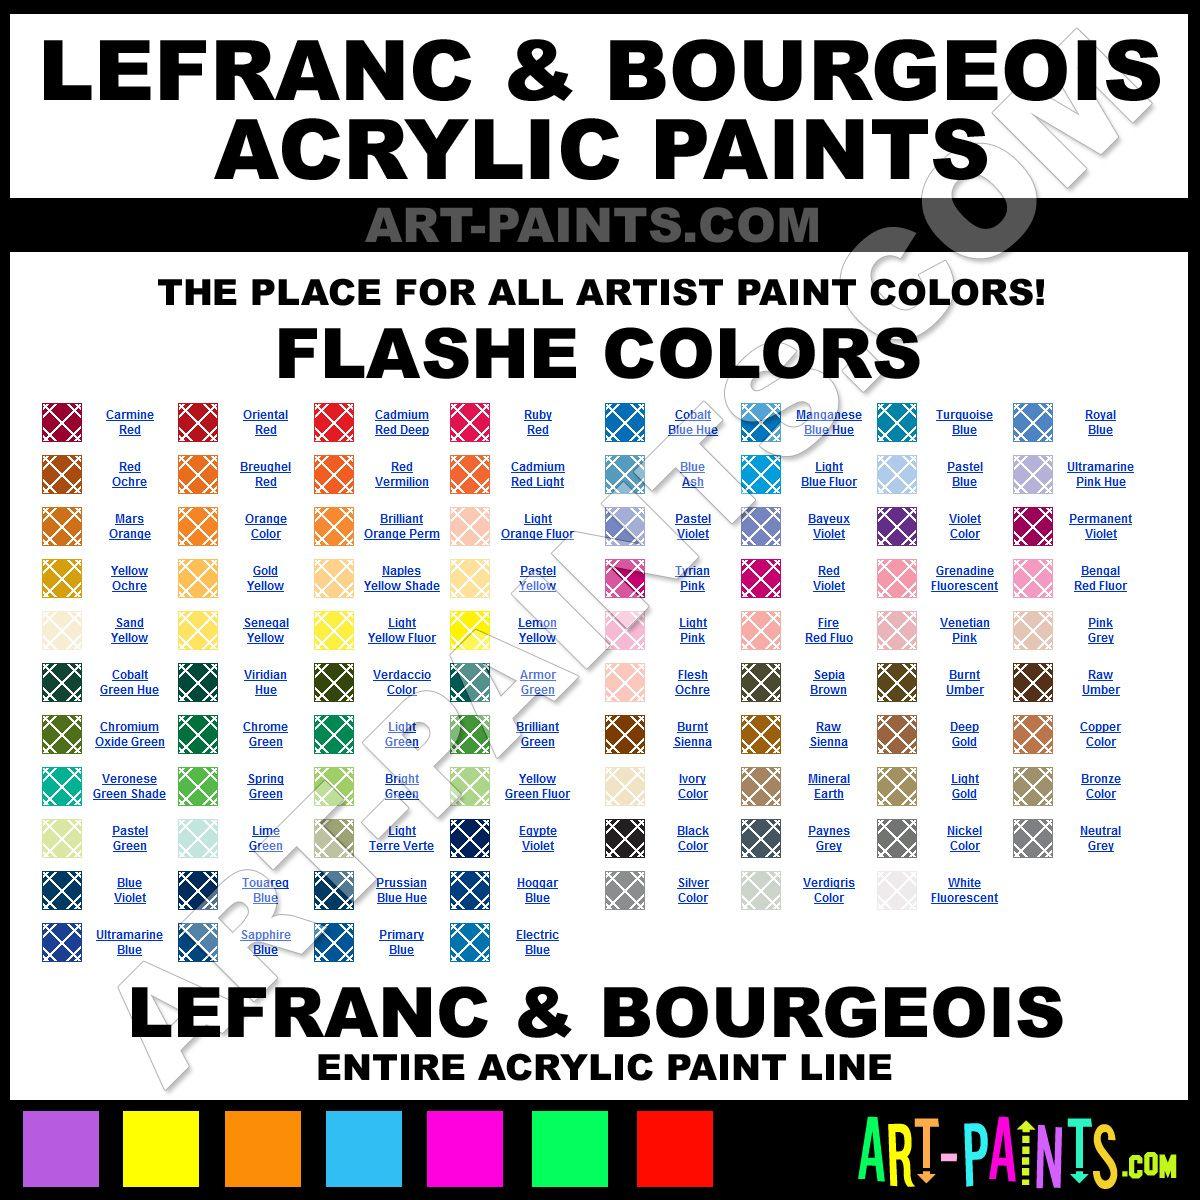 Folk art color chart acrylic paint - Bildergebnis F R Lefranc Bourgeois Flashe Color Chartscolours